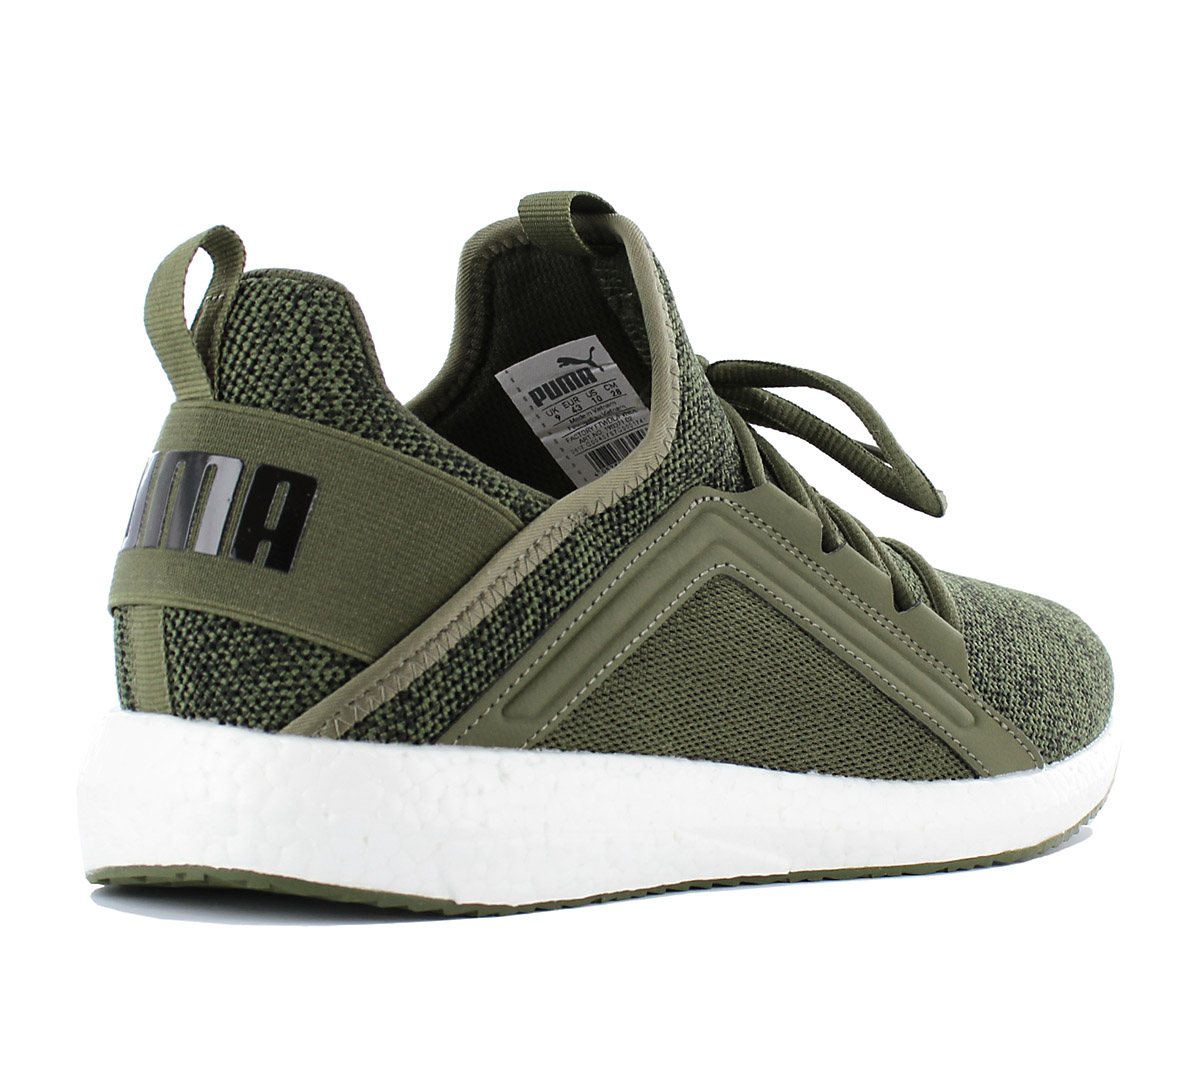 Puma Mega NRG Knit Shoes Men s Sneakers Olive Green Textile Trainers ... e8d3ec9e4